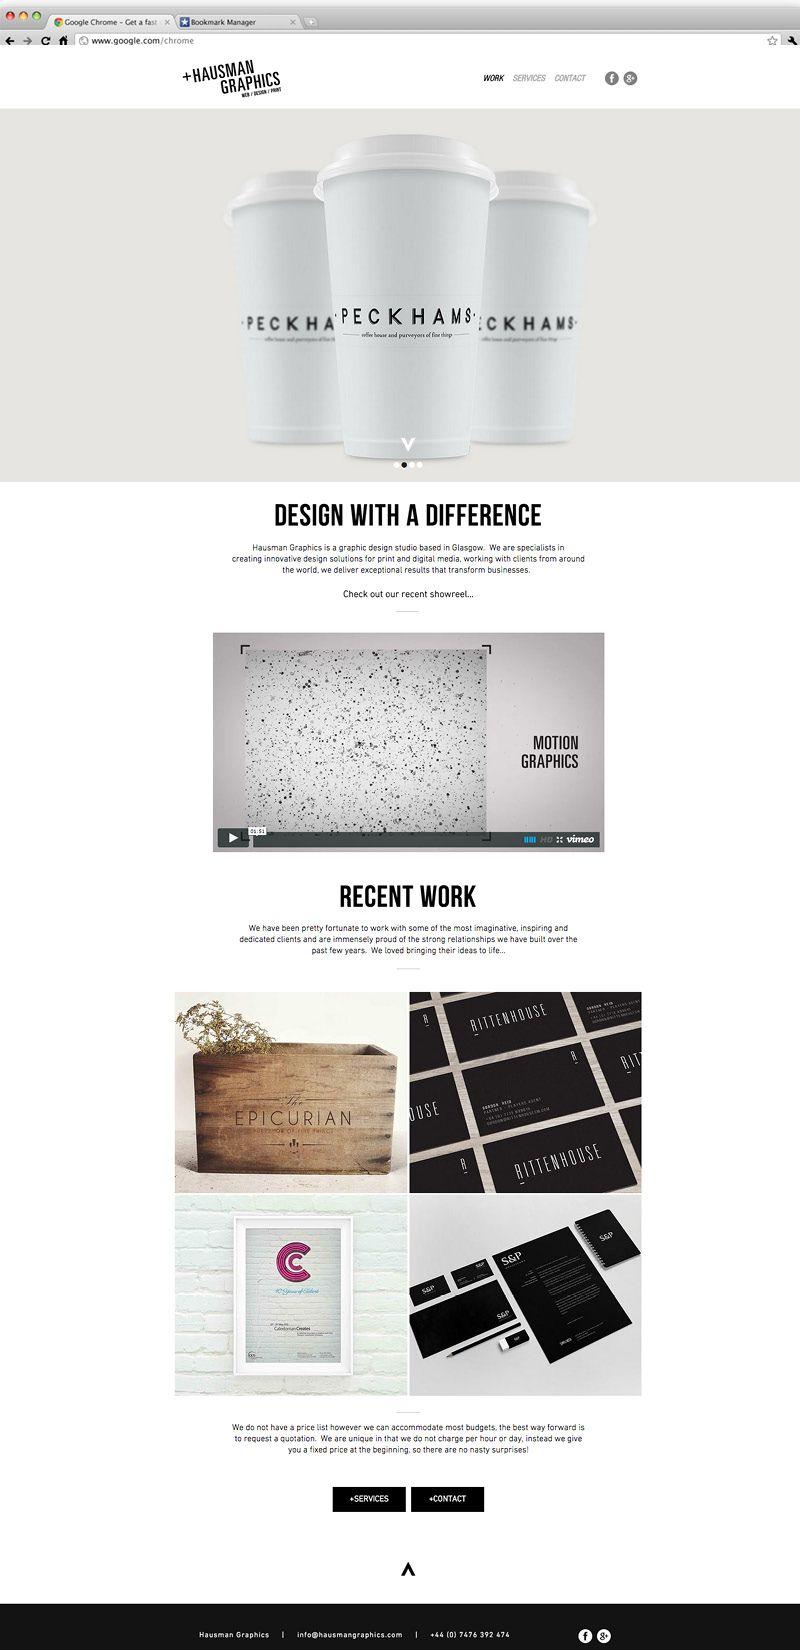 Hausman Graphics Graphic Design Web Design Glasgow Web Design Web Design Agency Create Website